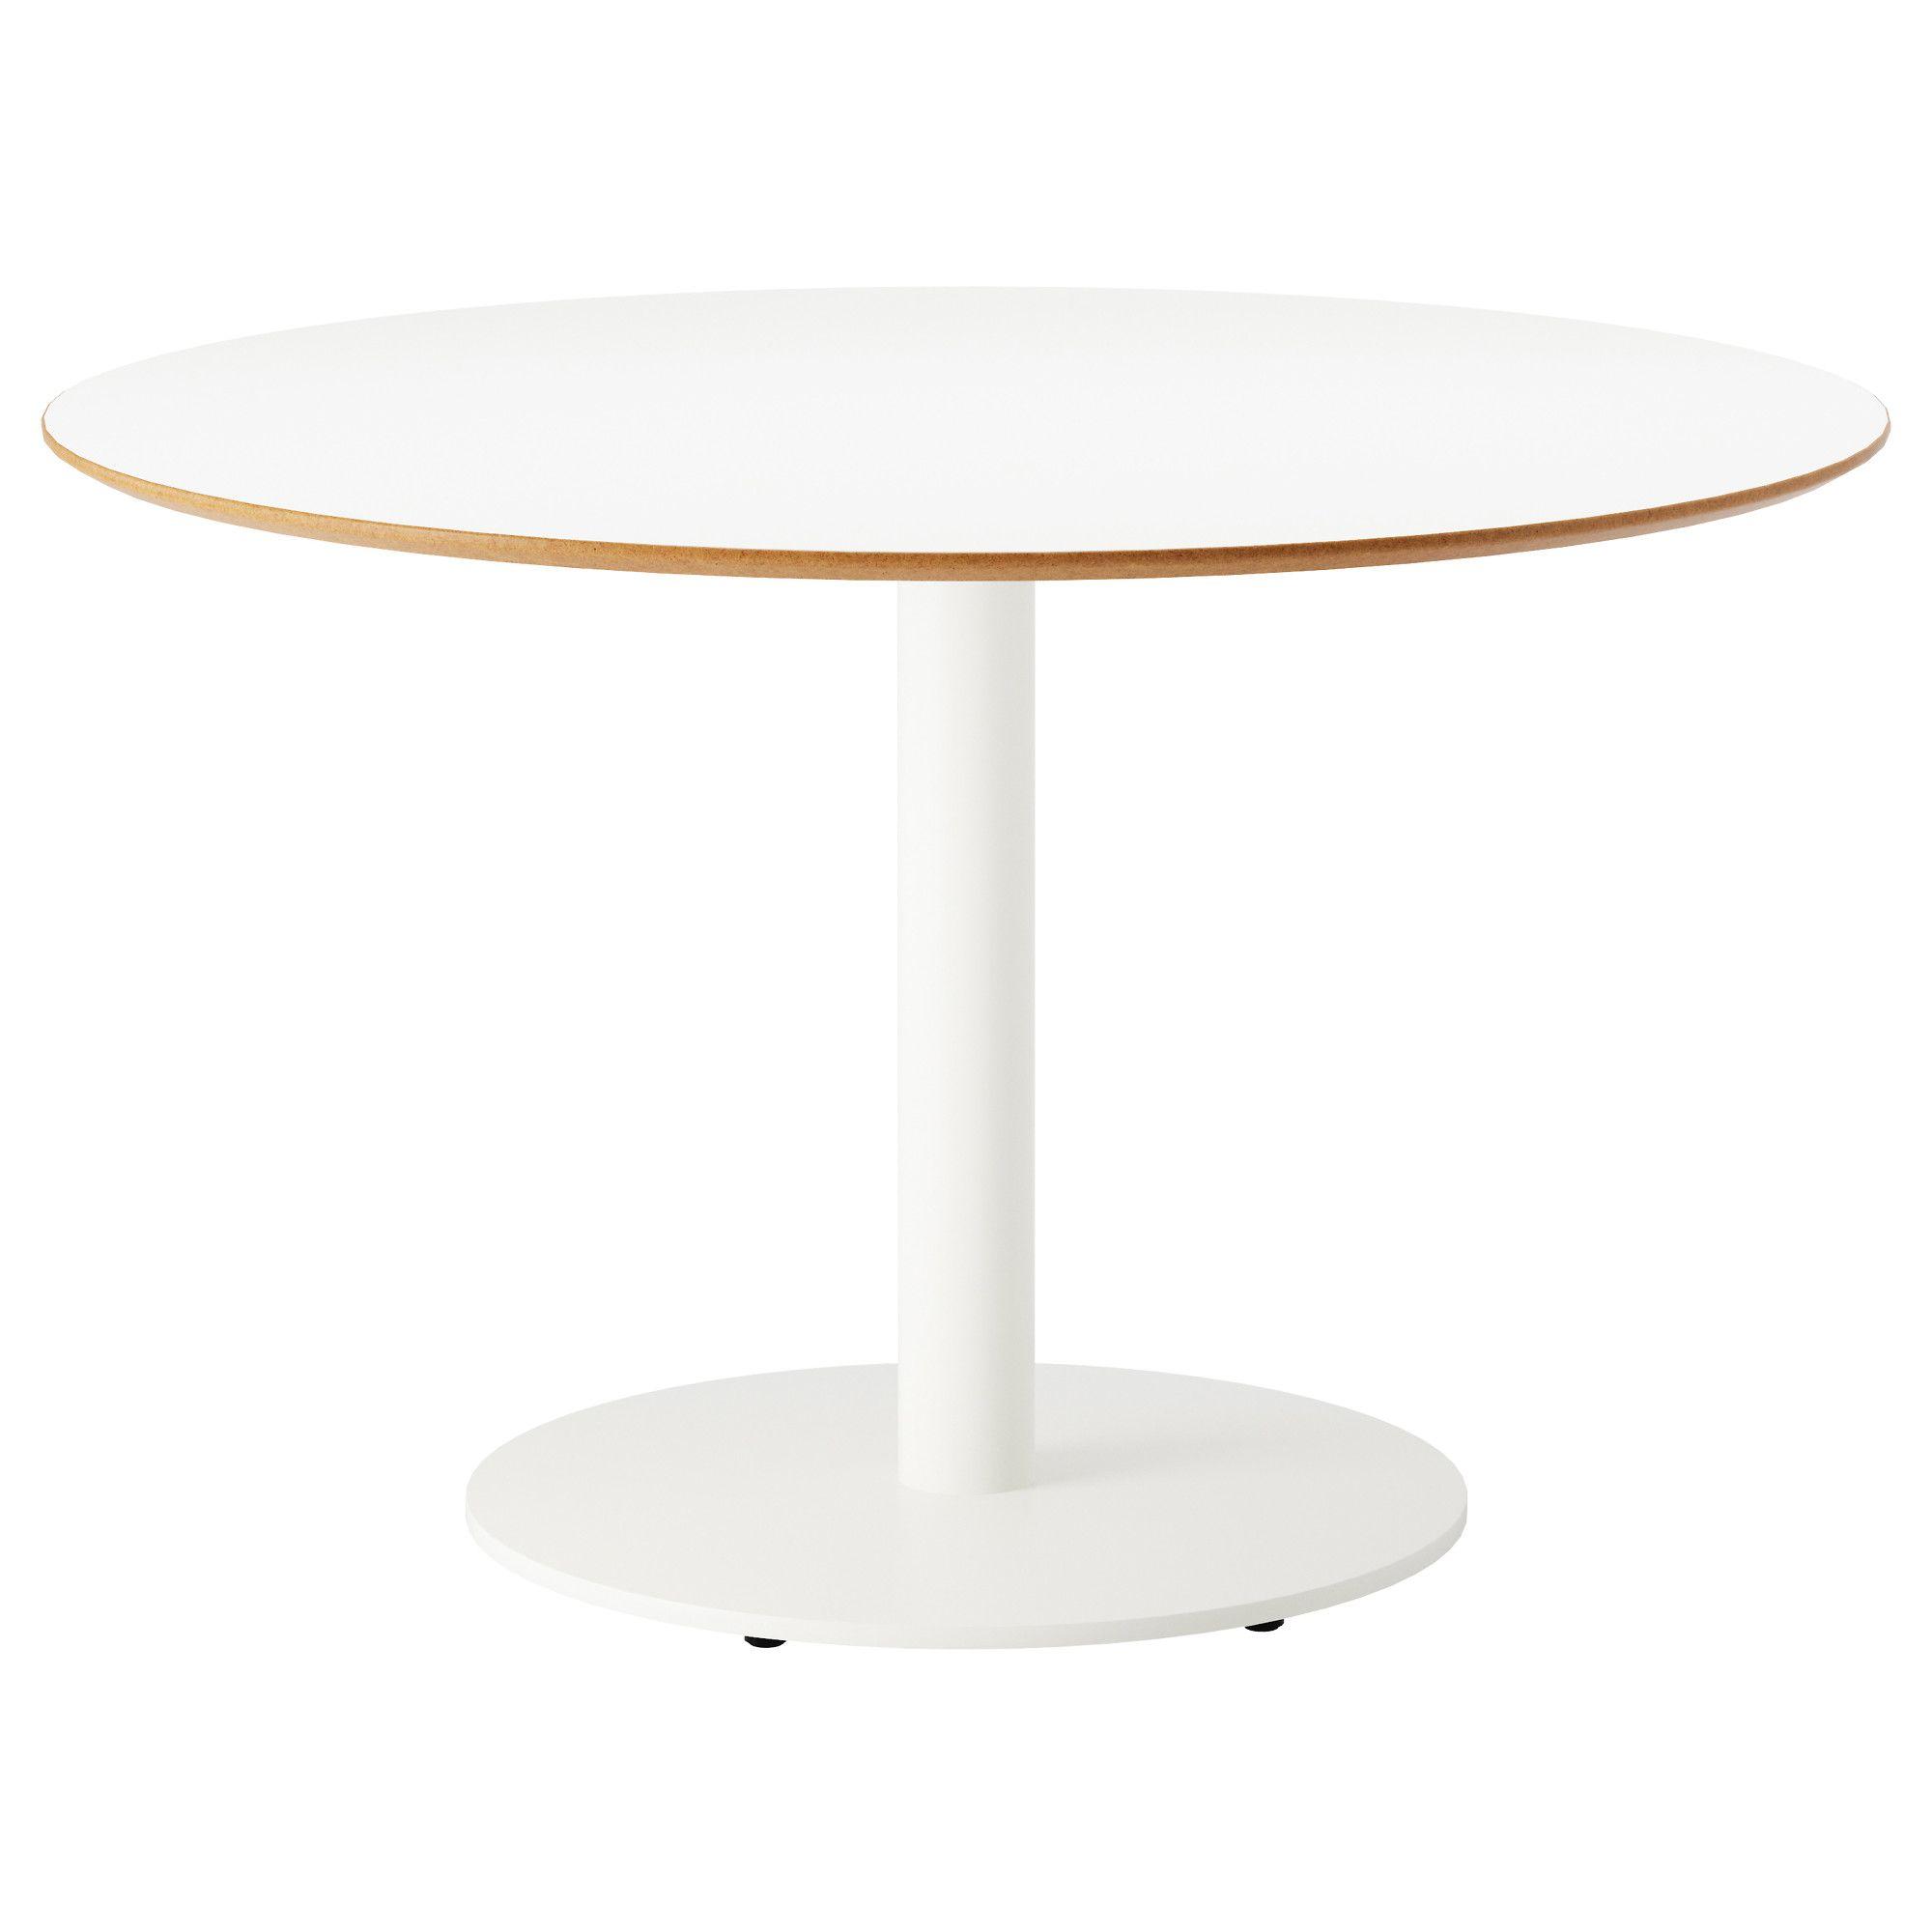 plateau de table ikea spartakiev. Black Bedroom Furniture Sets. Home Design Ideas